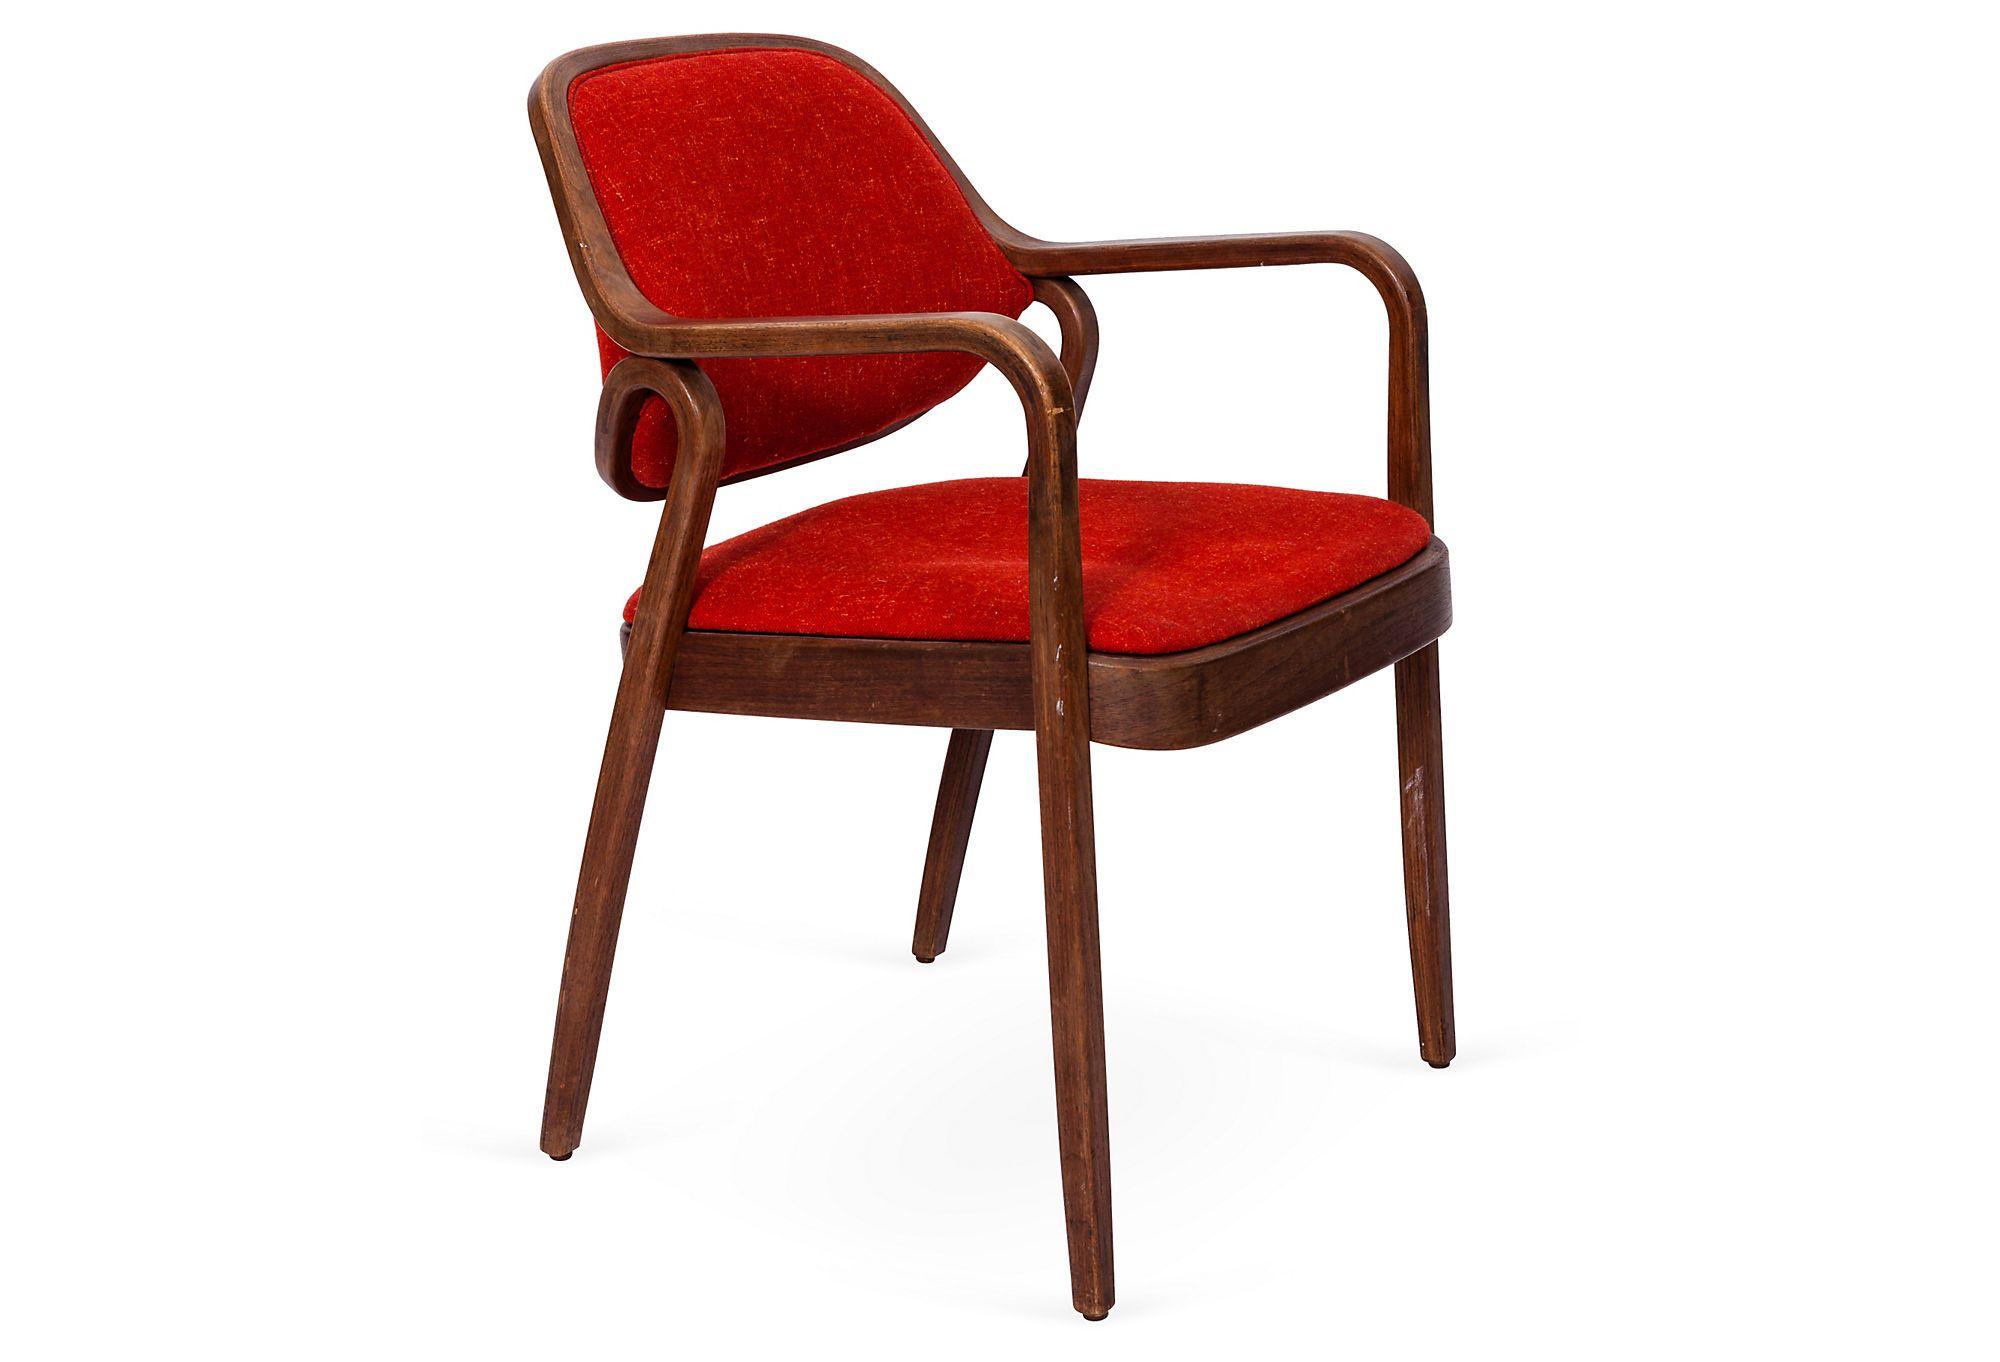 Orange Woven Midcentury Wood Chair - 1960s